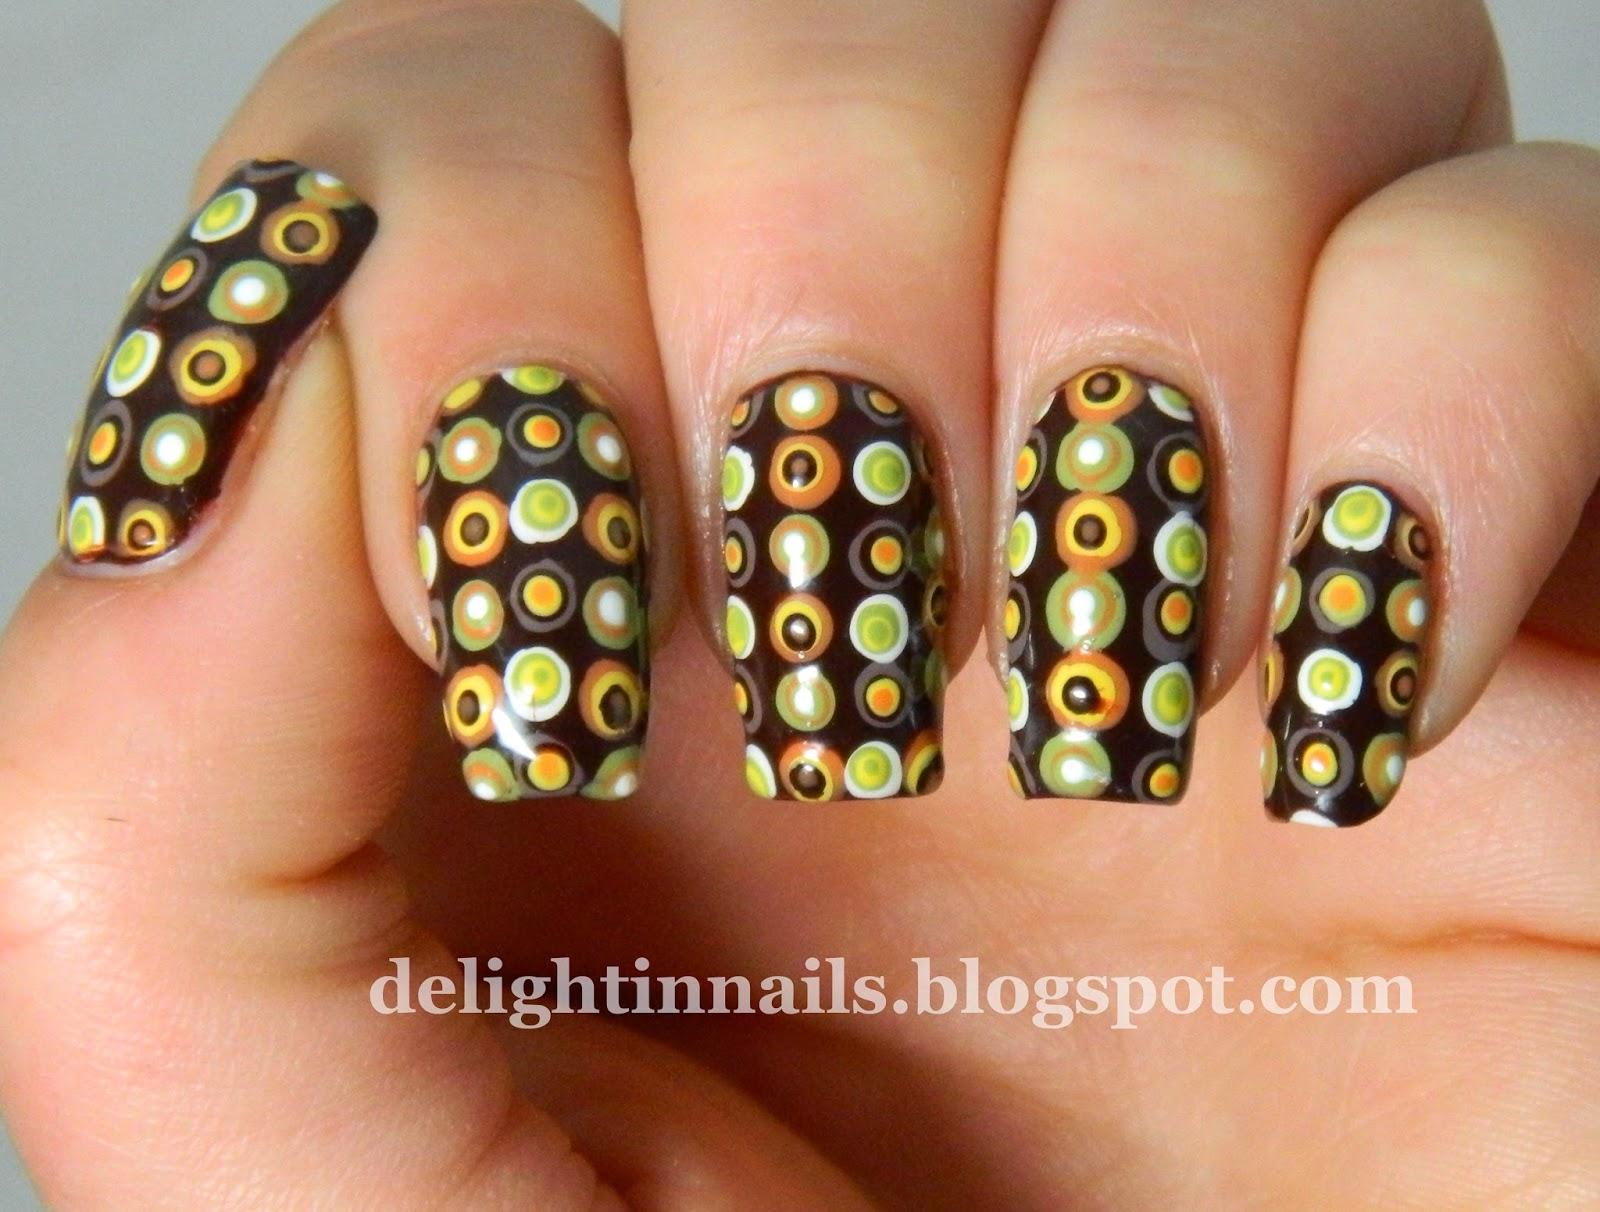 Seventies Manicure